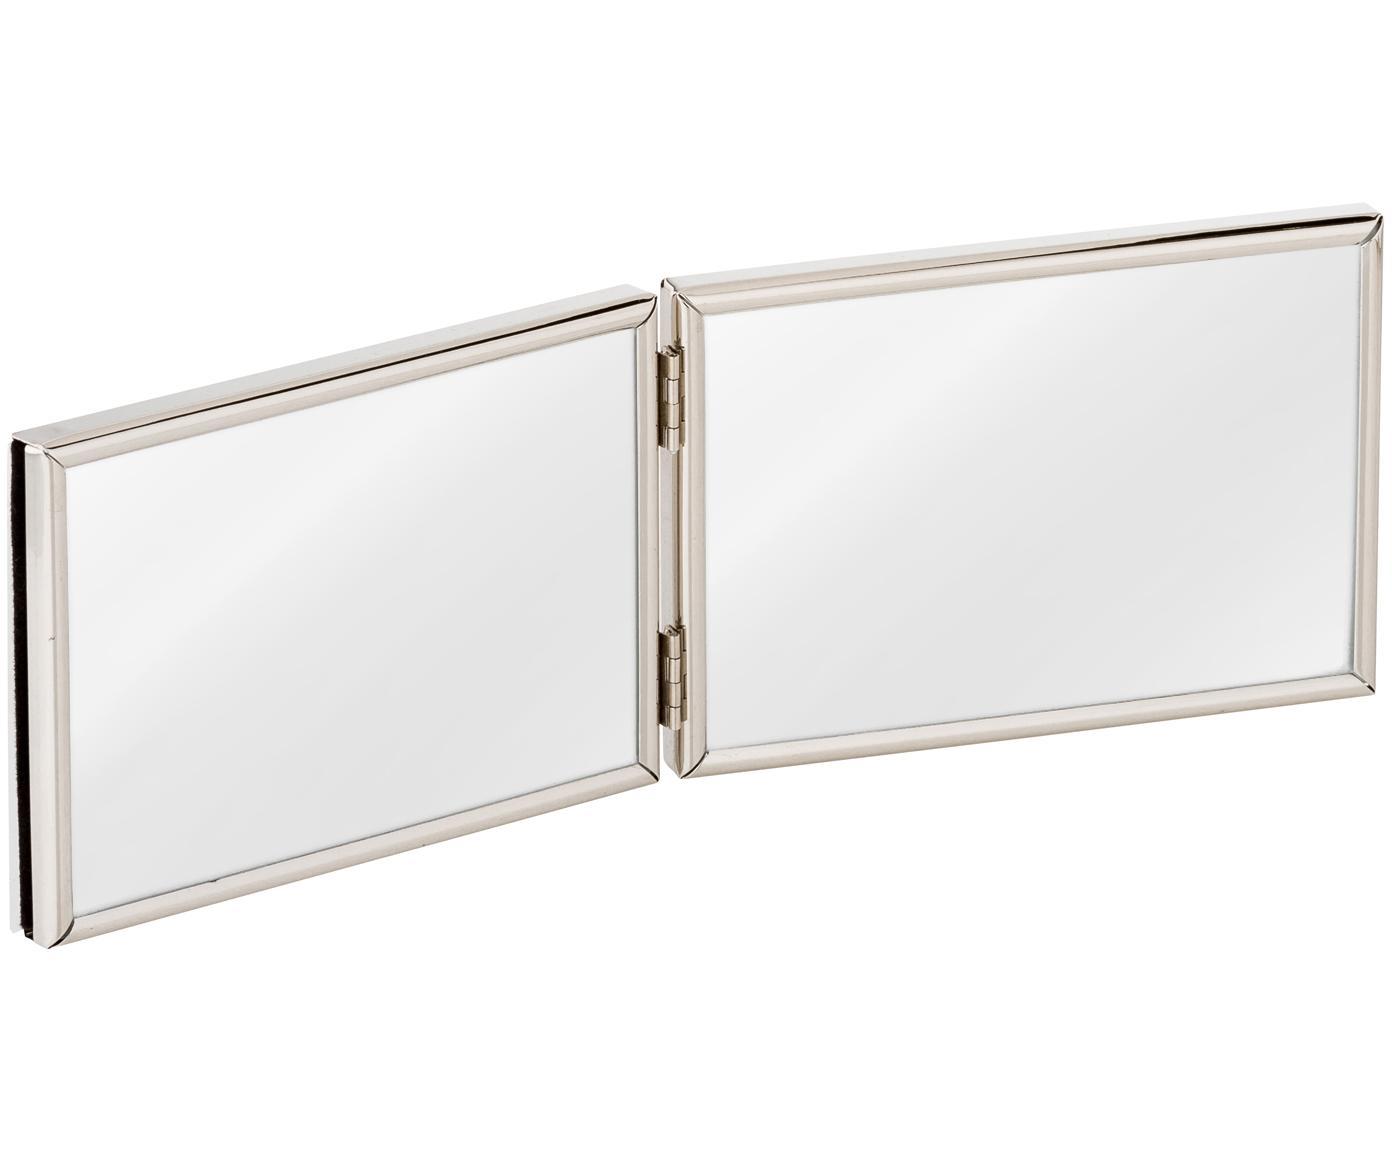 Marco Carla, Marco: plateado Cristal: transparente, An 15 x Al 10 cm